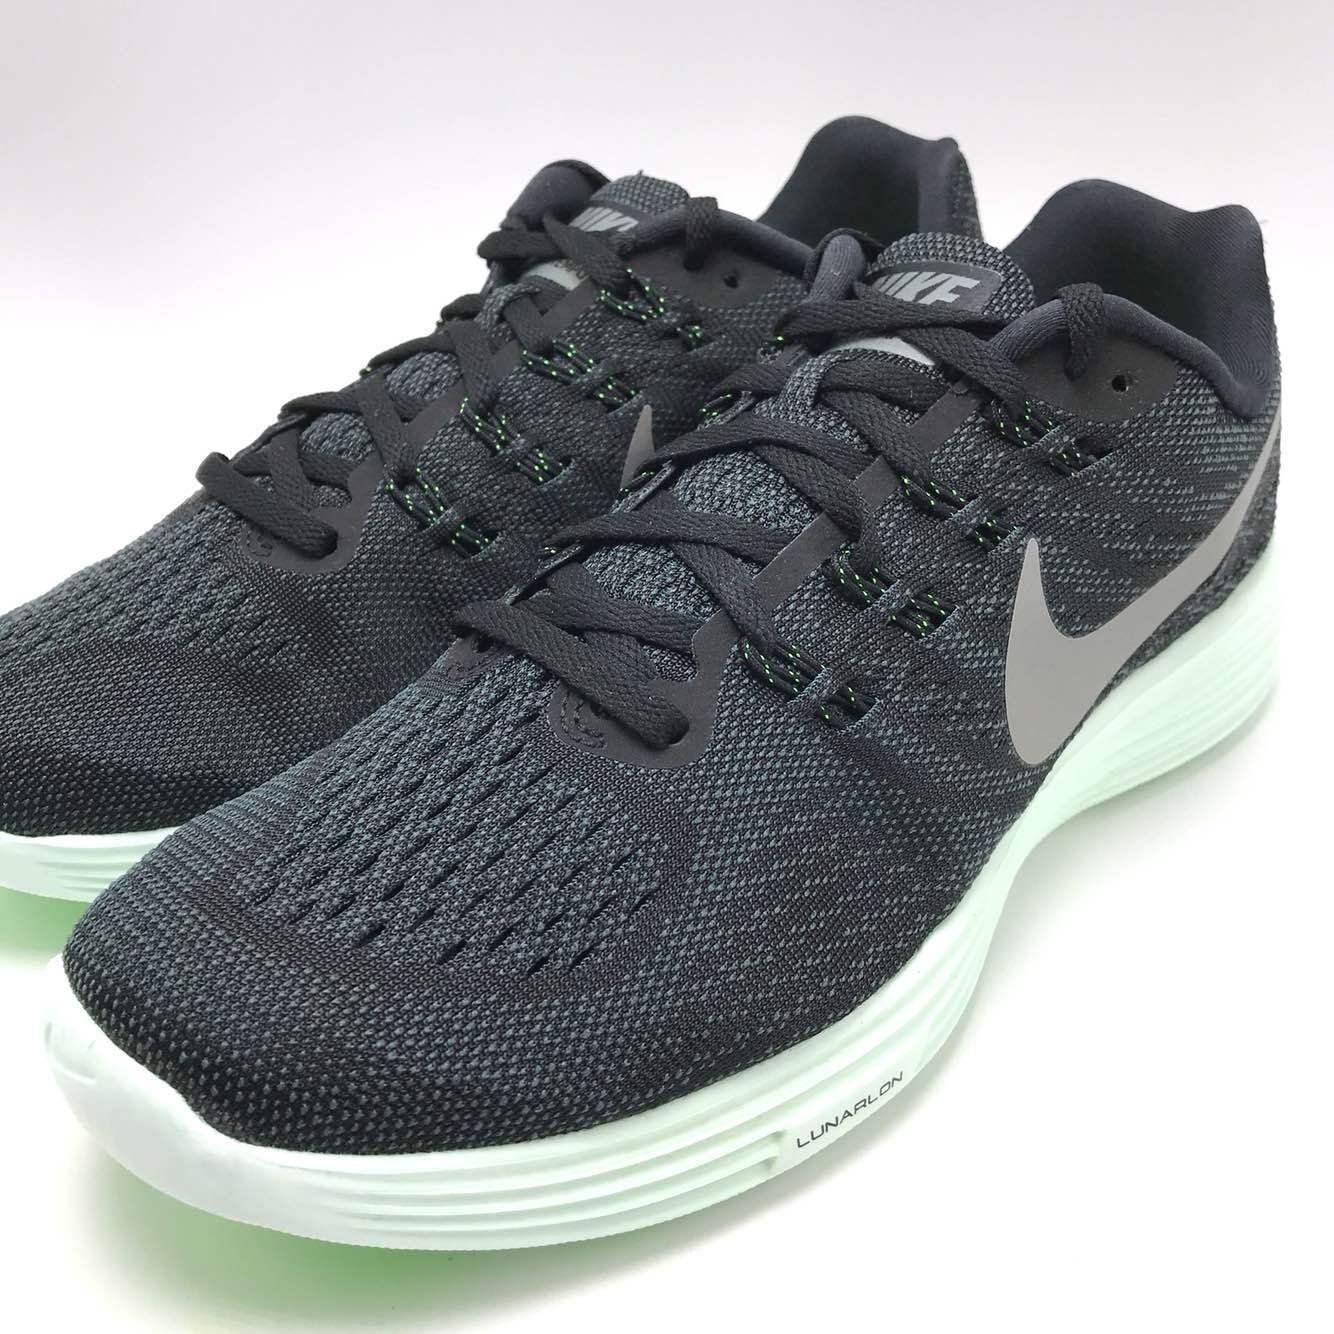 Nike Lunartempo 2 LB Black / Green Men's Running Trainer Shoes 828659-003